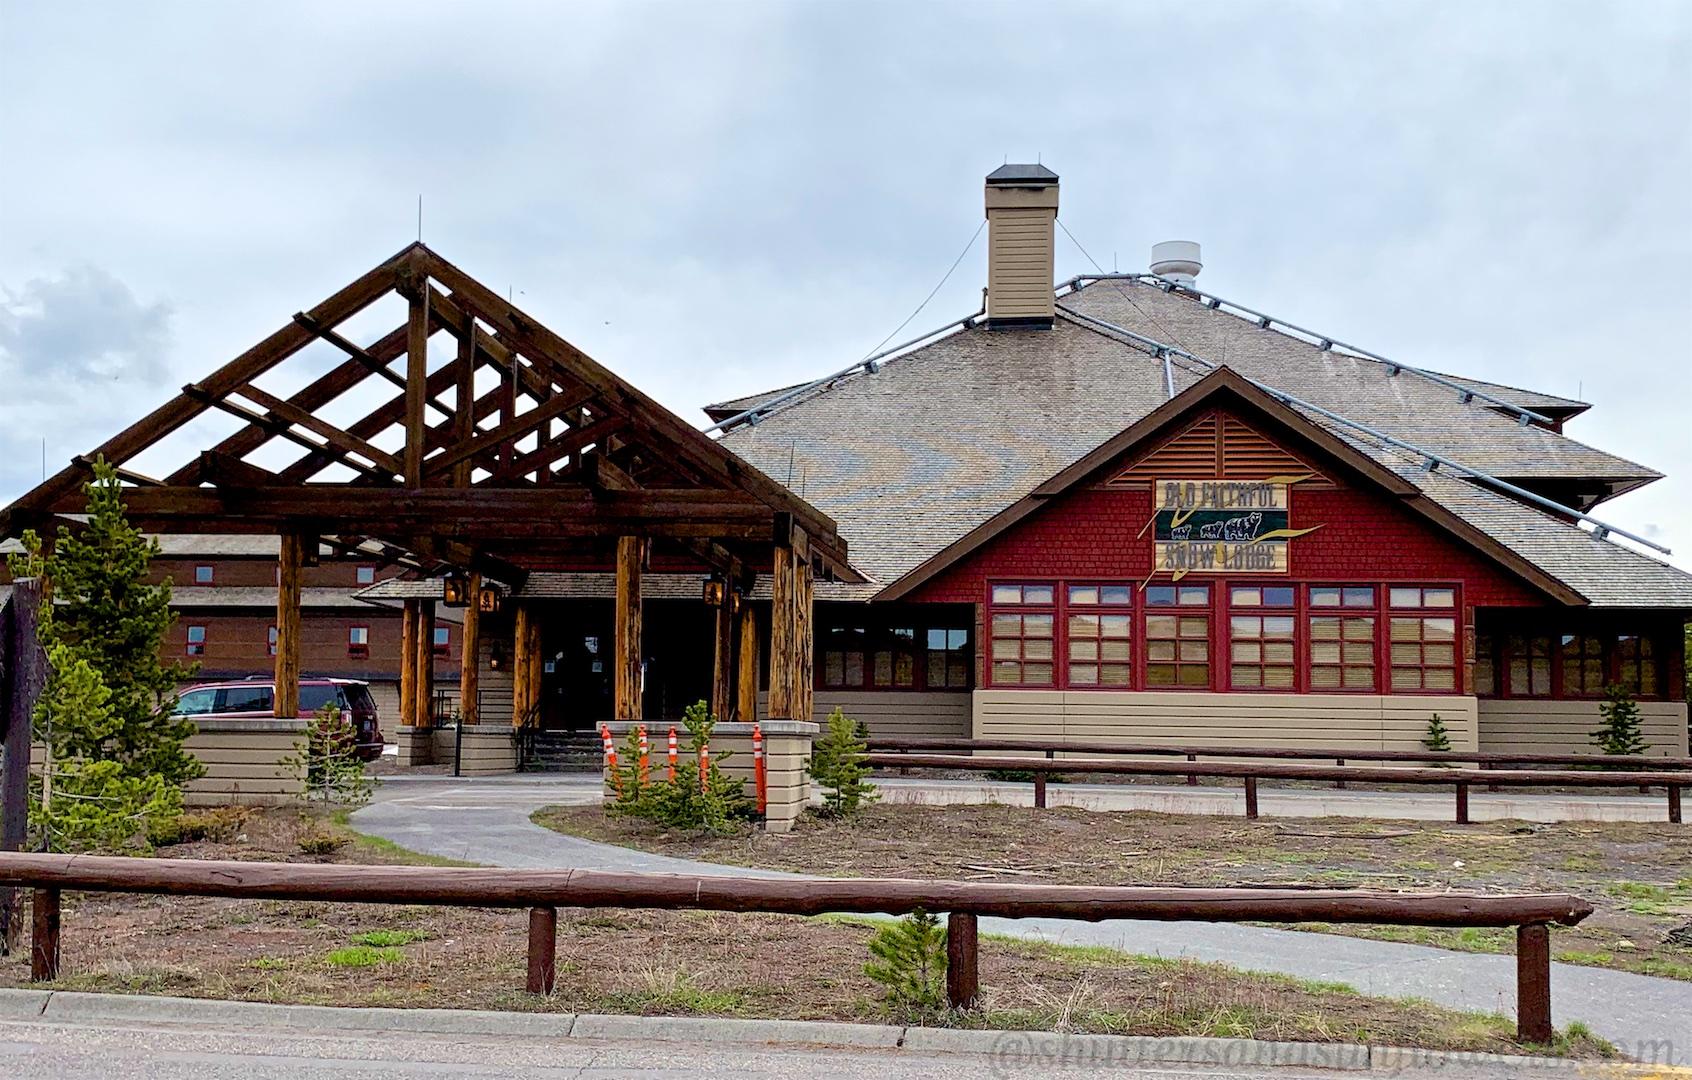 Old Faithful Snow Lodge, Yellowstone National Park, USA